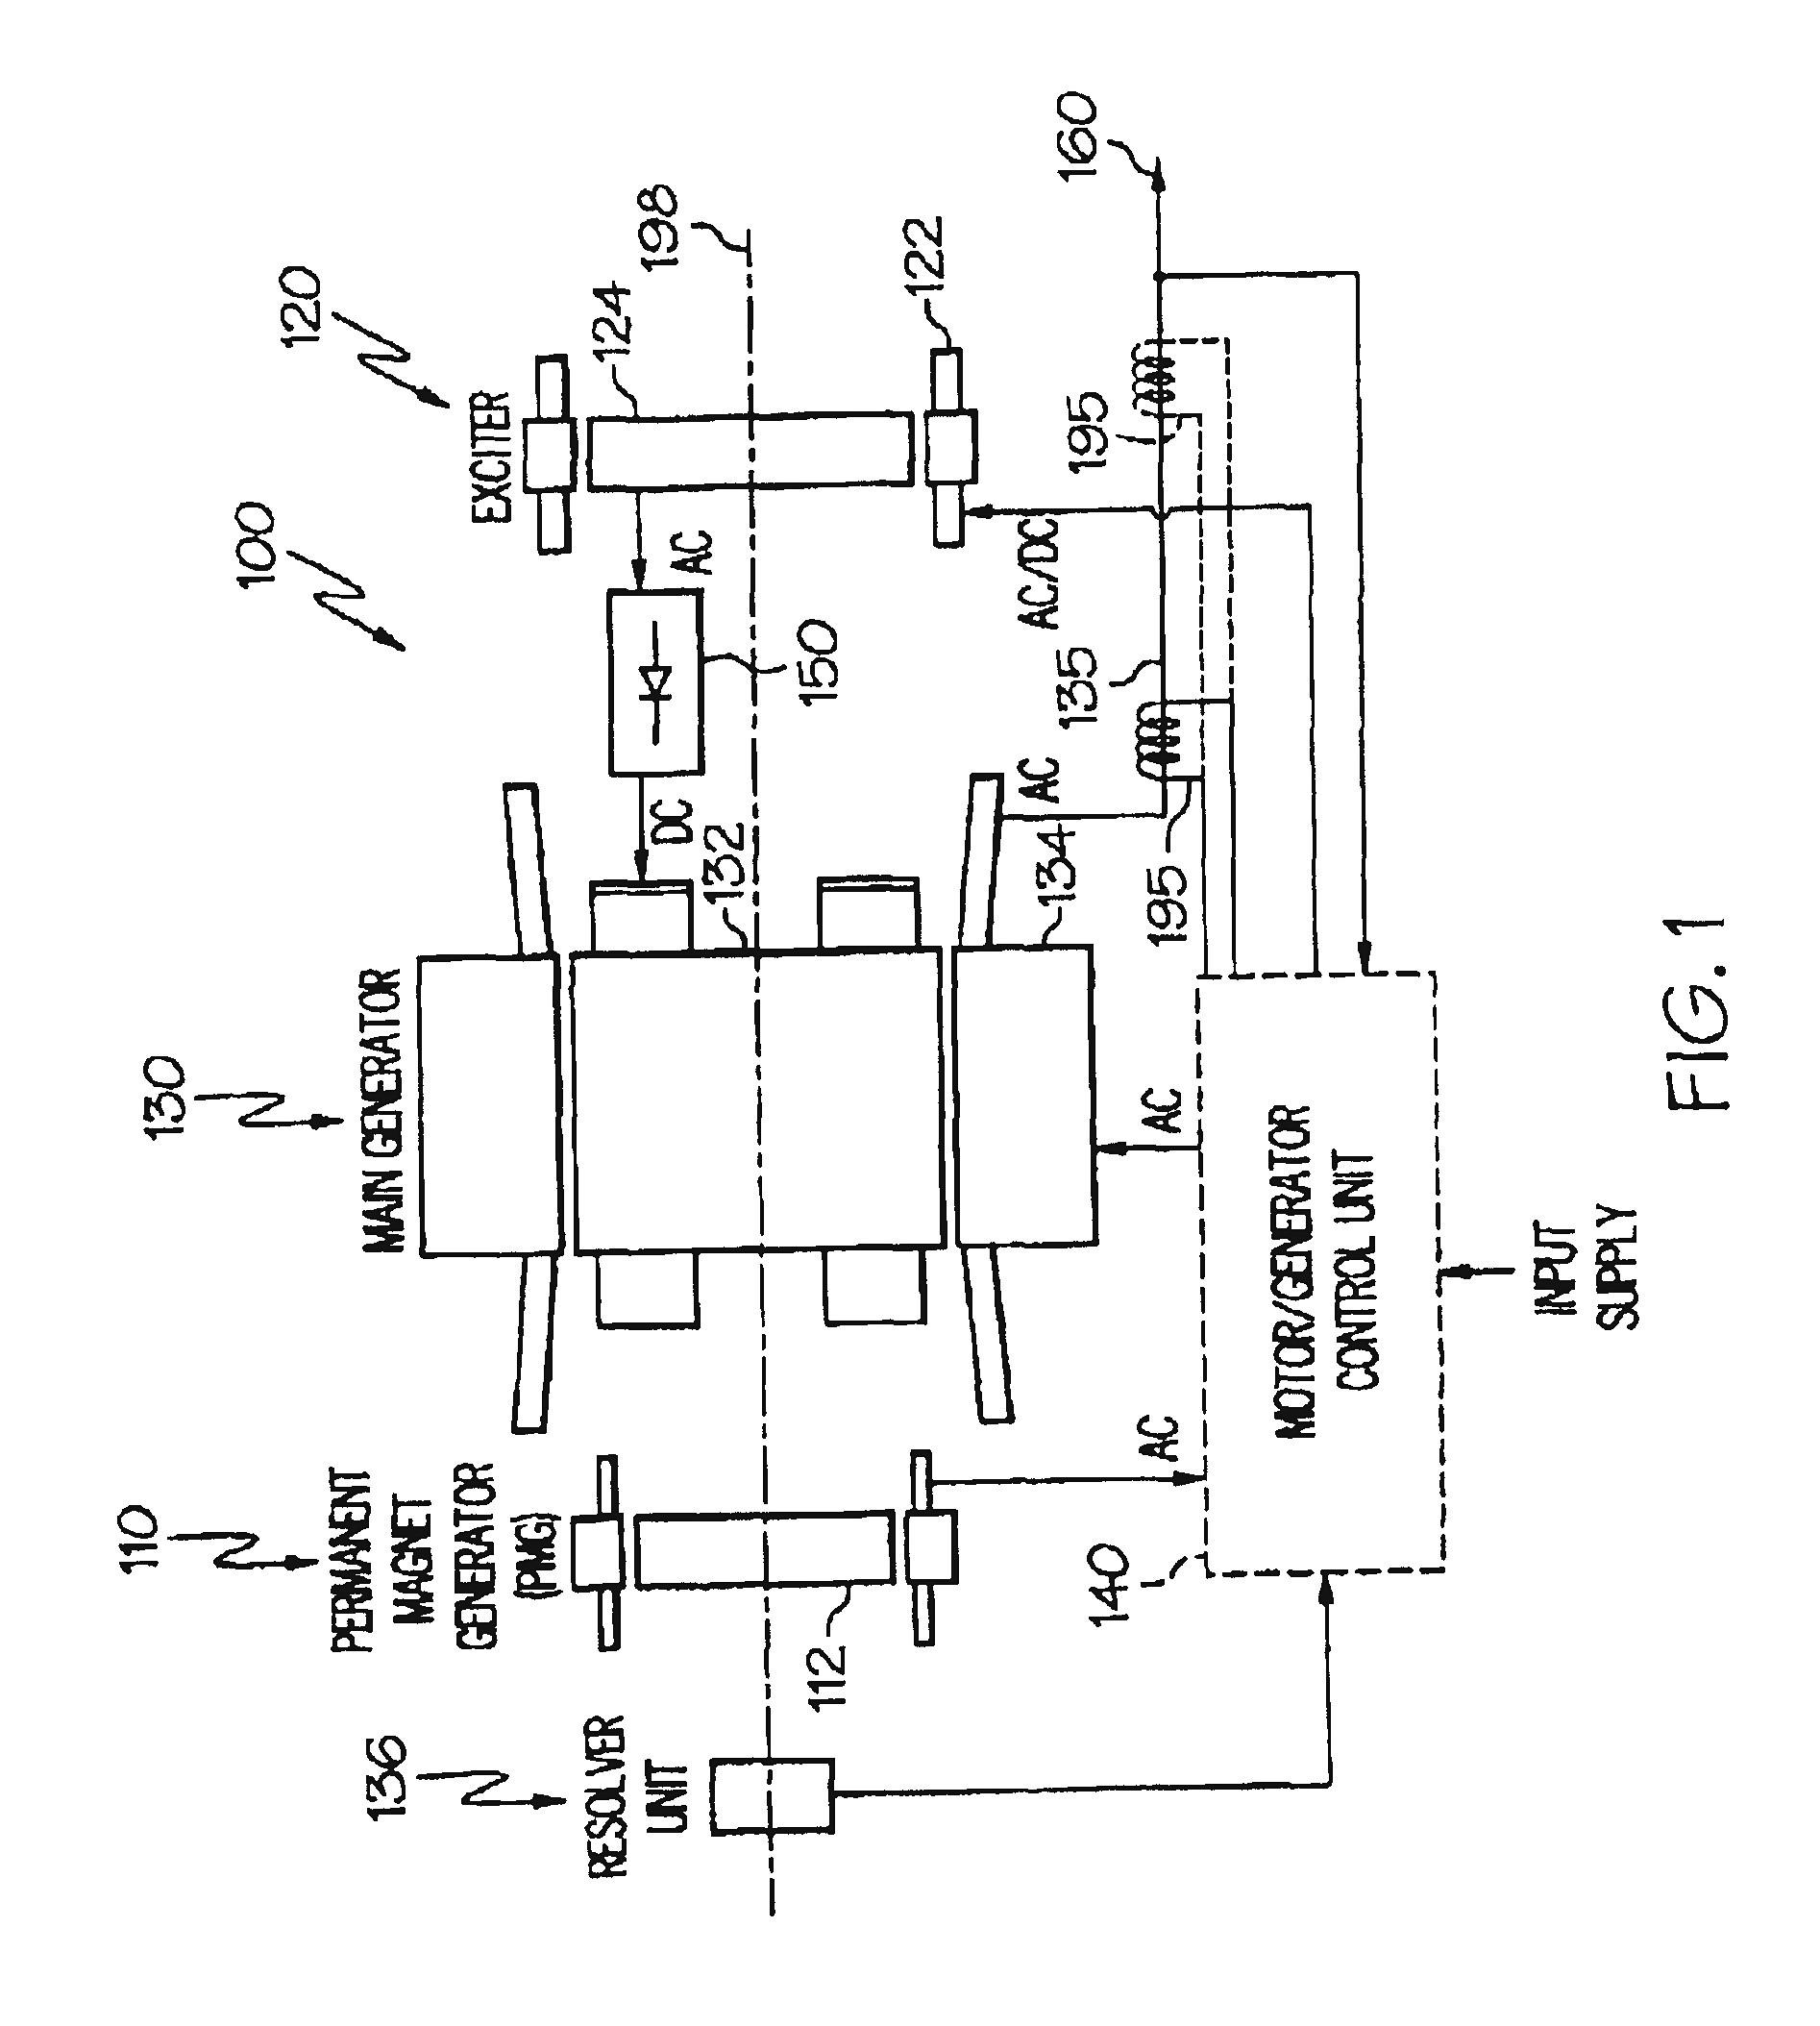 Starter Generator Wiring Diagram Aircraft Inspirationa Fine Engine Starter Diagram Inspiration Electrical Diagram Ideas